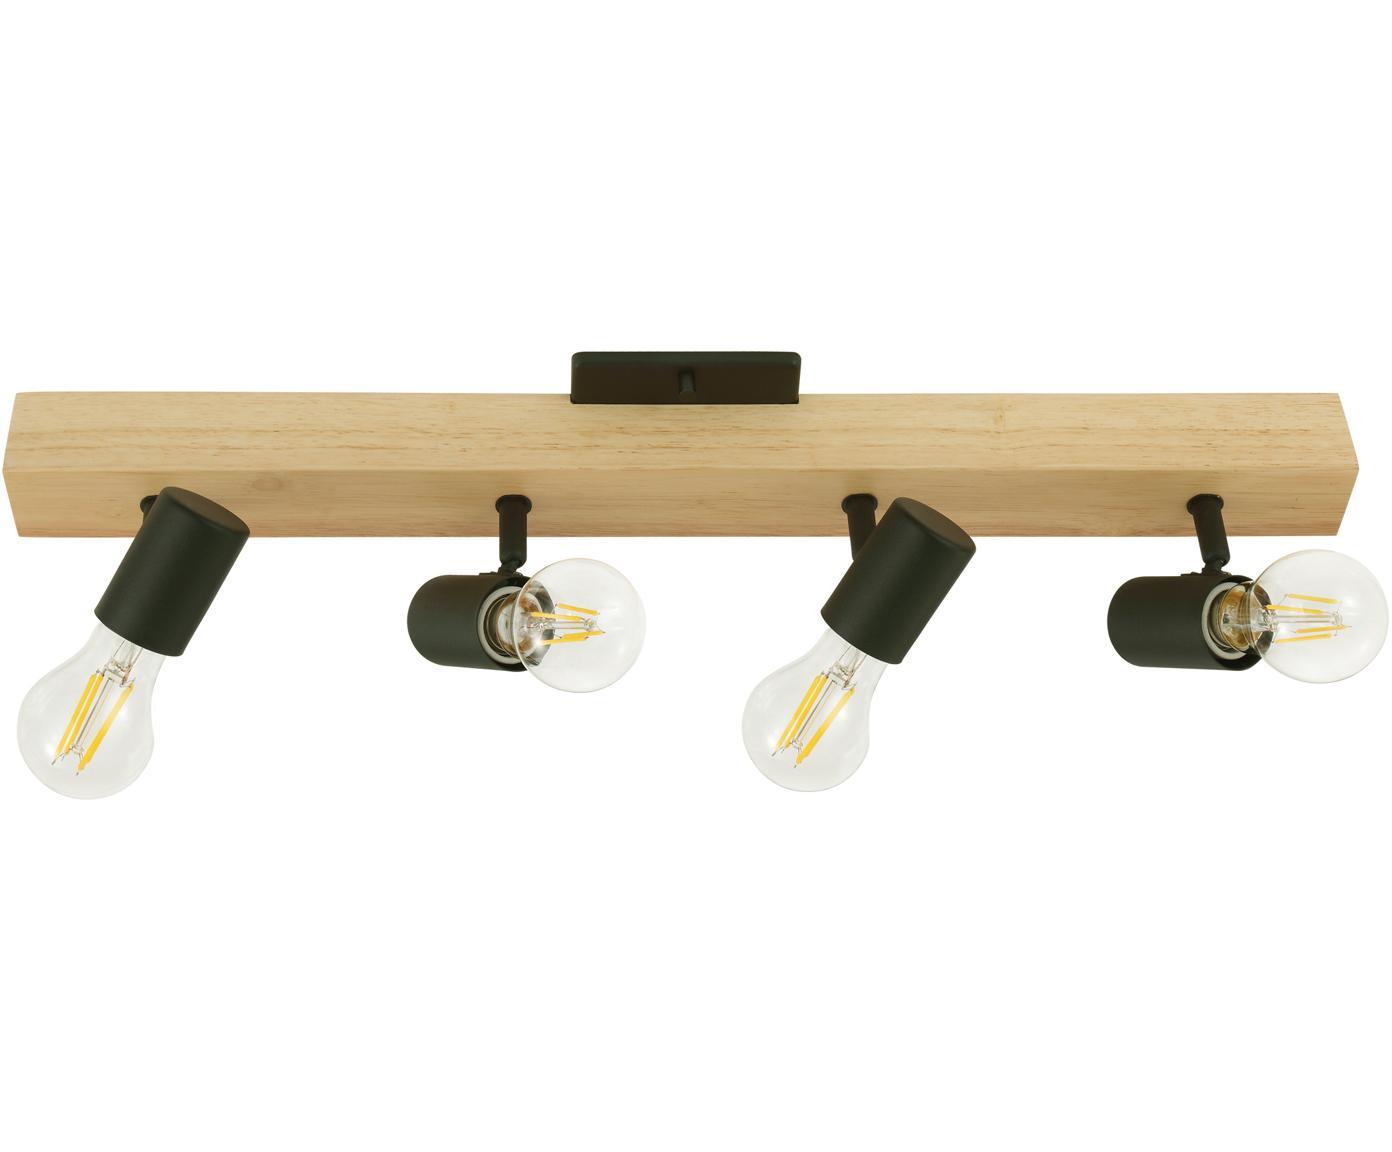 Riel Townshend, Barra: madera, Negro, madera, An 63 x Al 13 cm